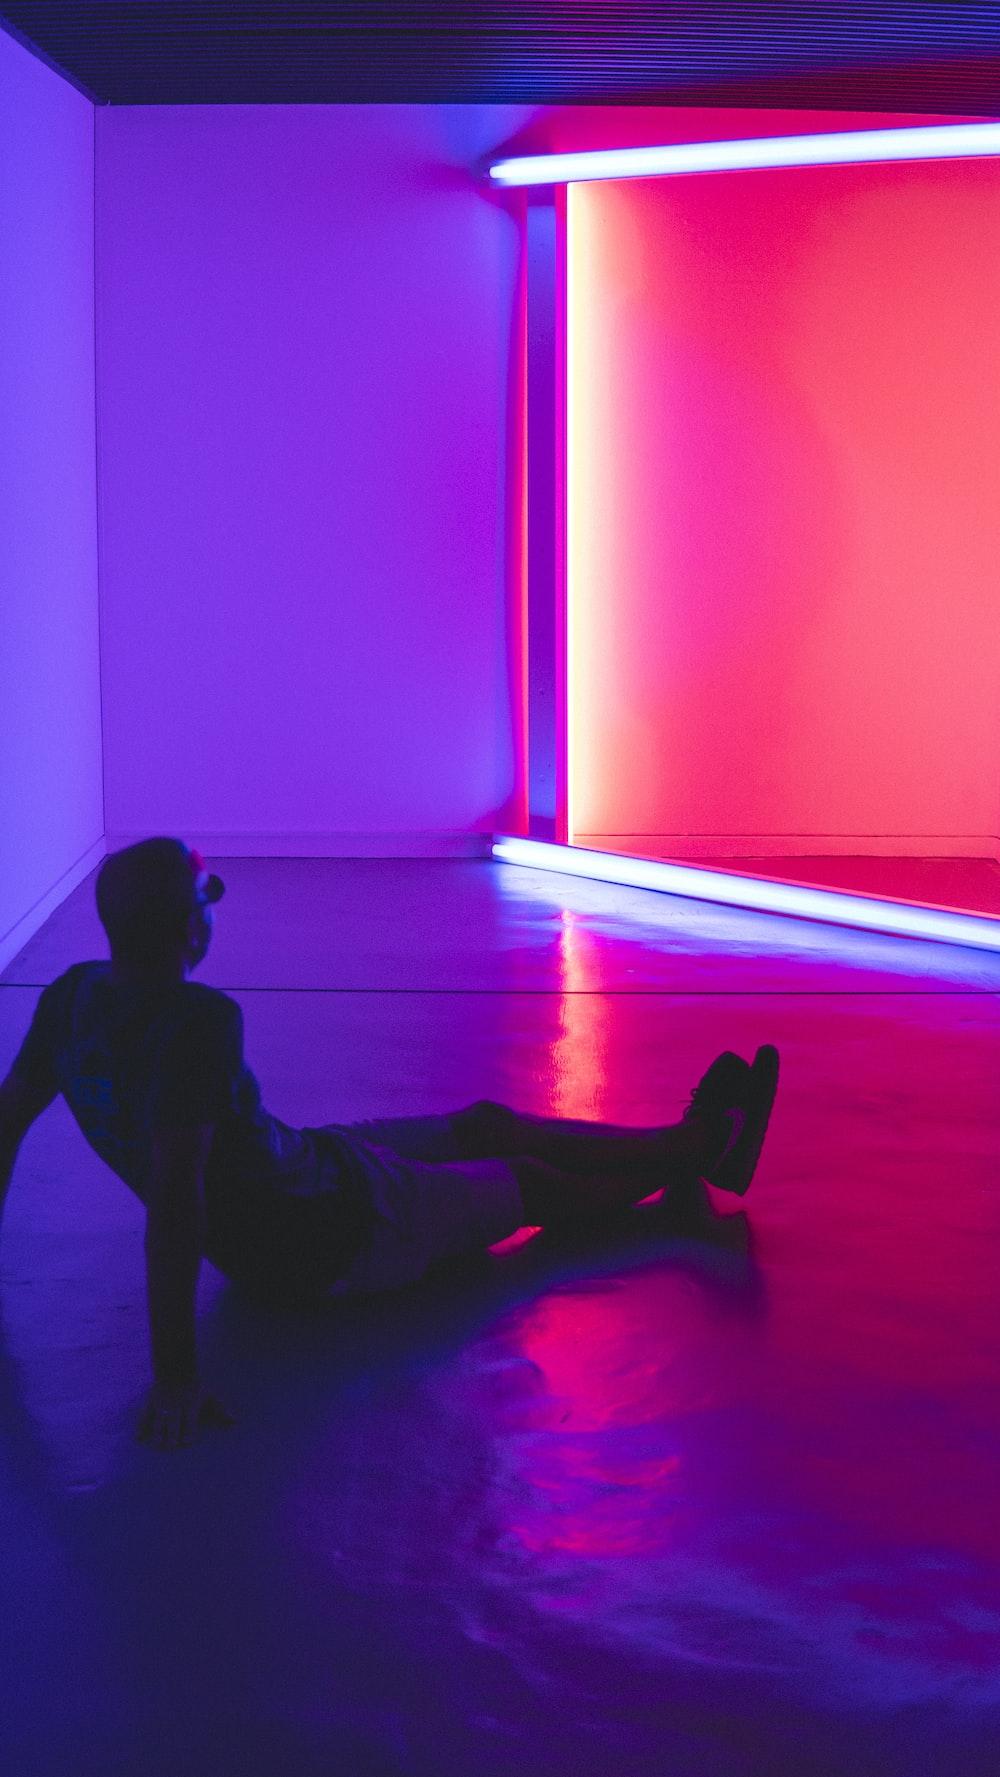 man sitting on floor facing a lighted room area